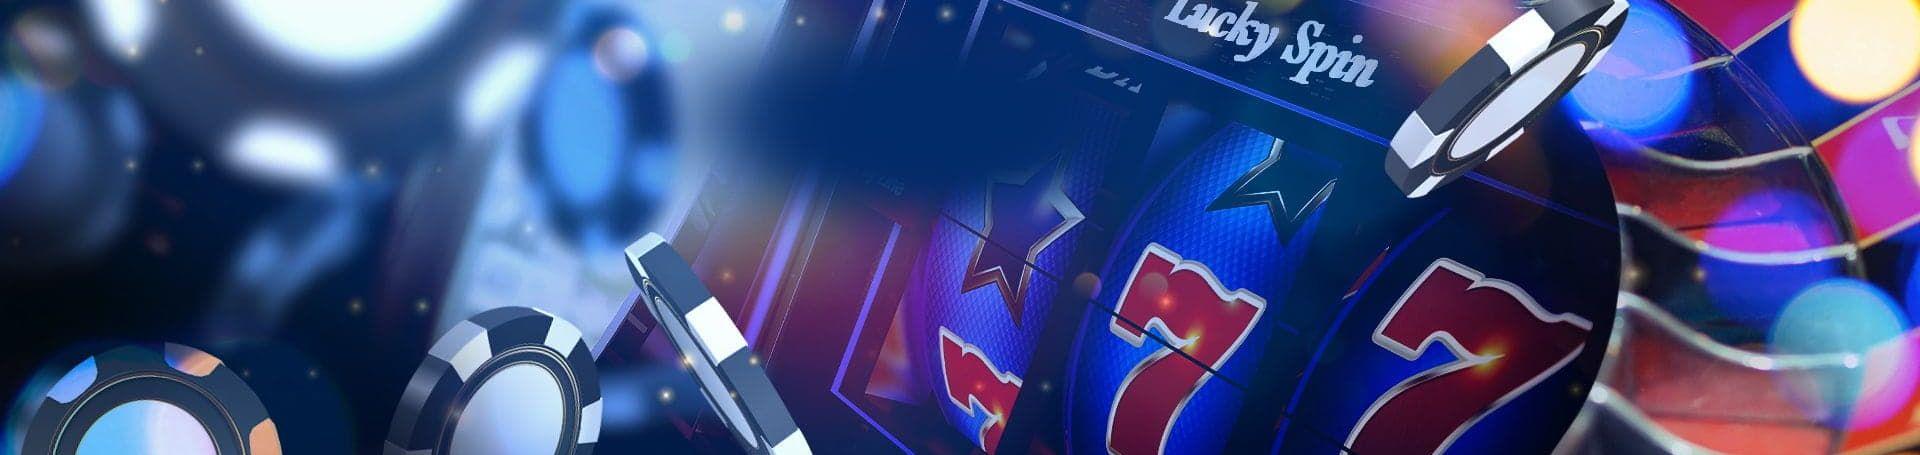 Play Online Casino Games | up to $400 Bonus | Casino.com IN